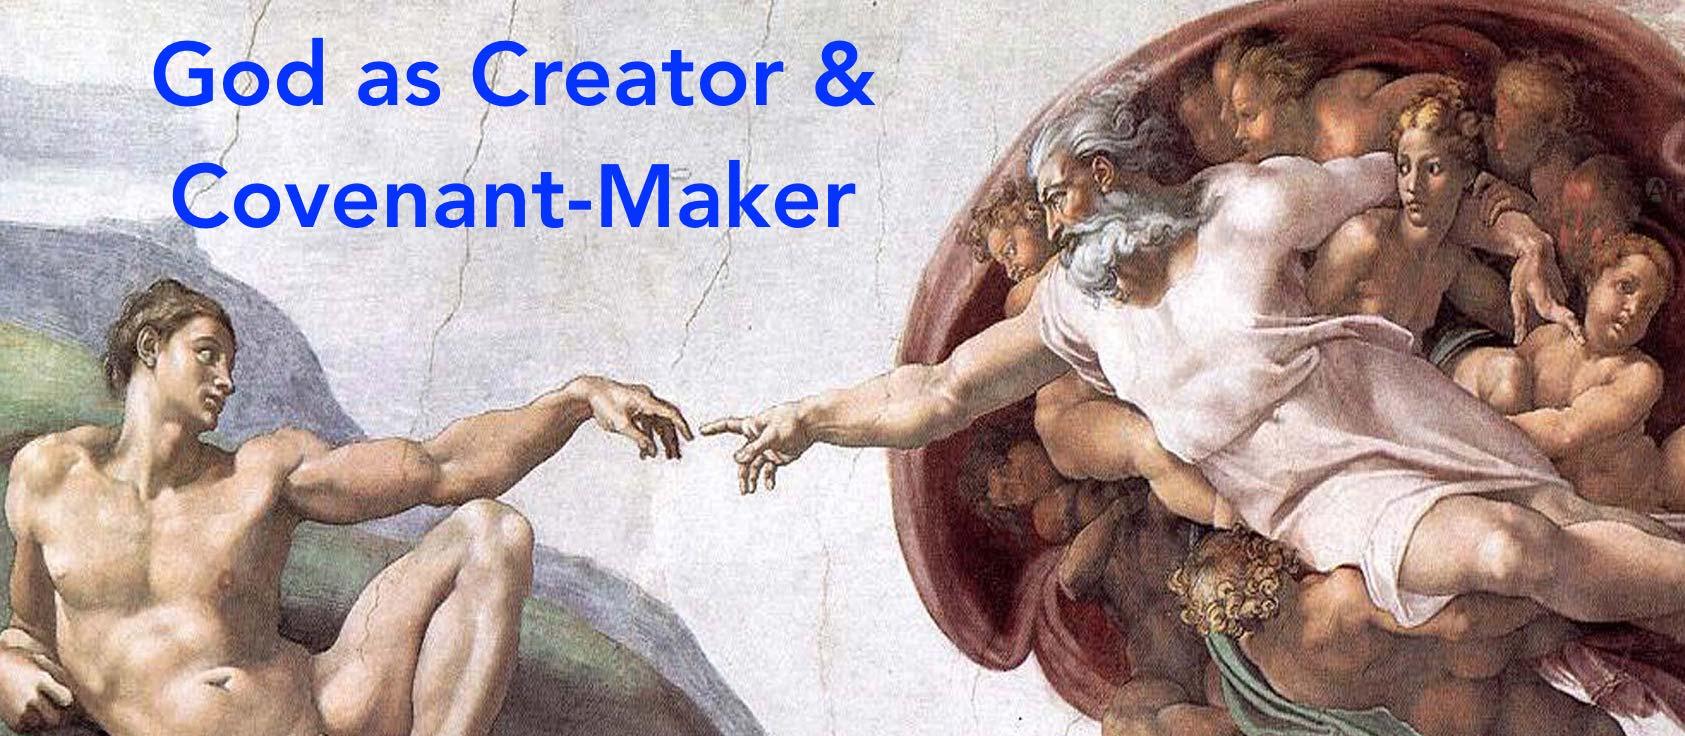 Creation of Adam Croped copy.jpeg